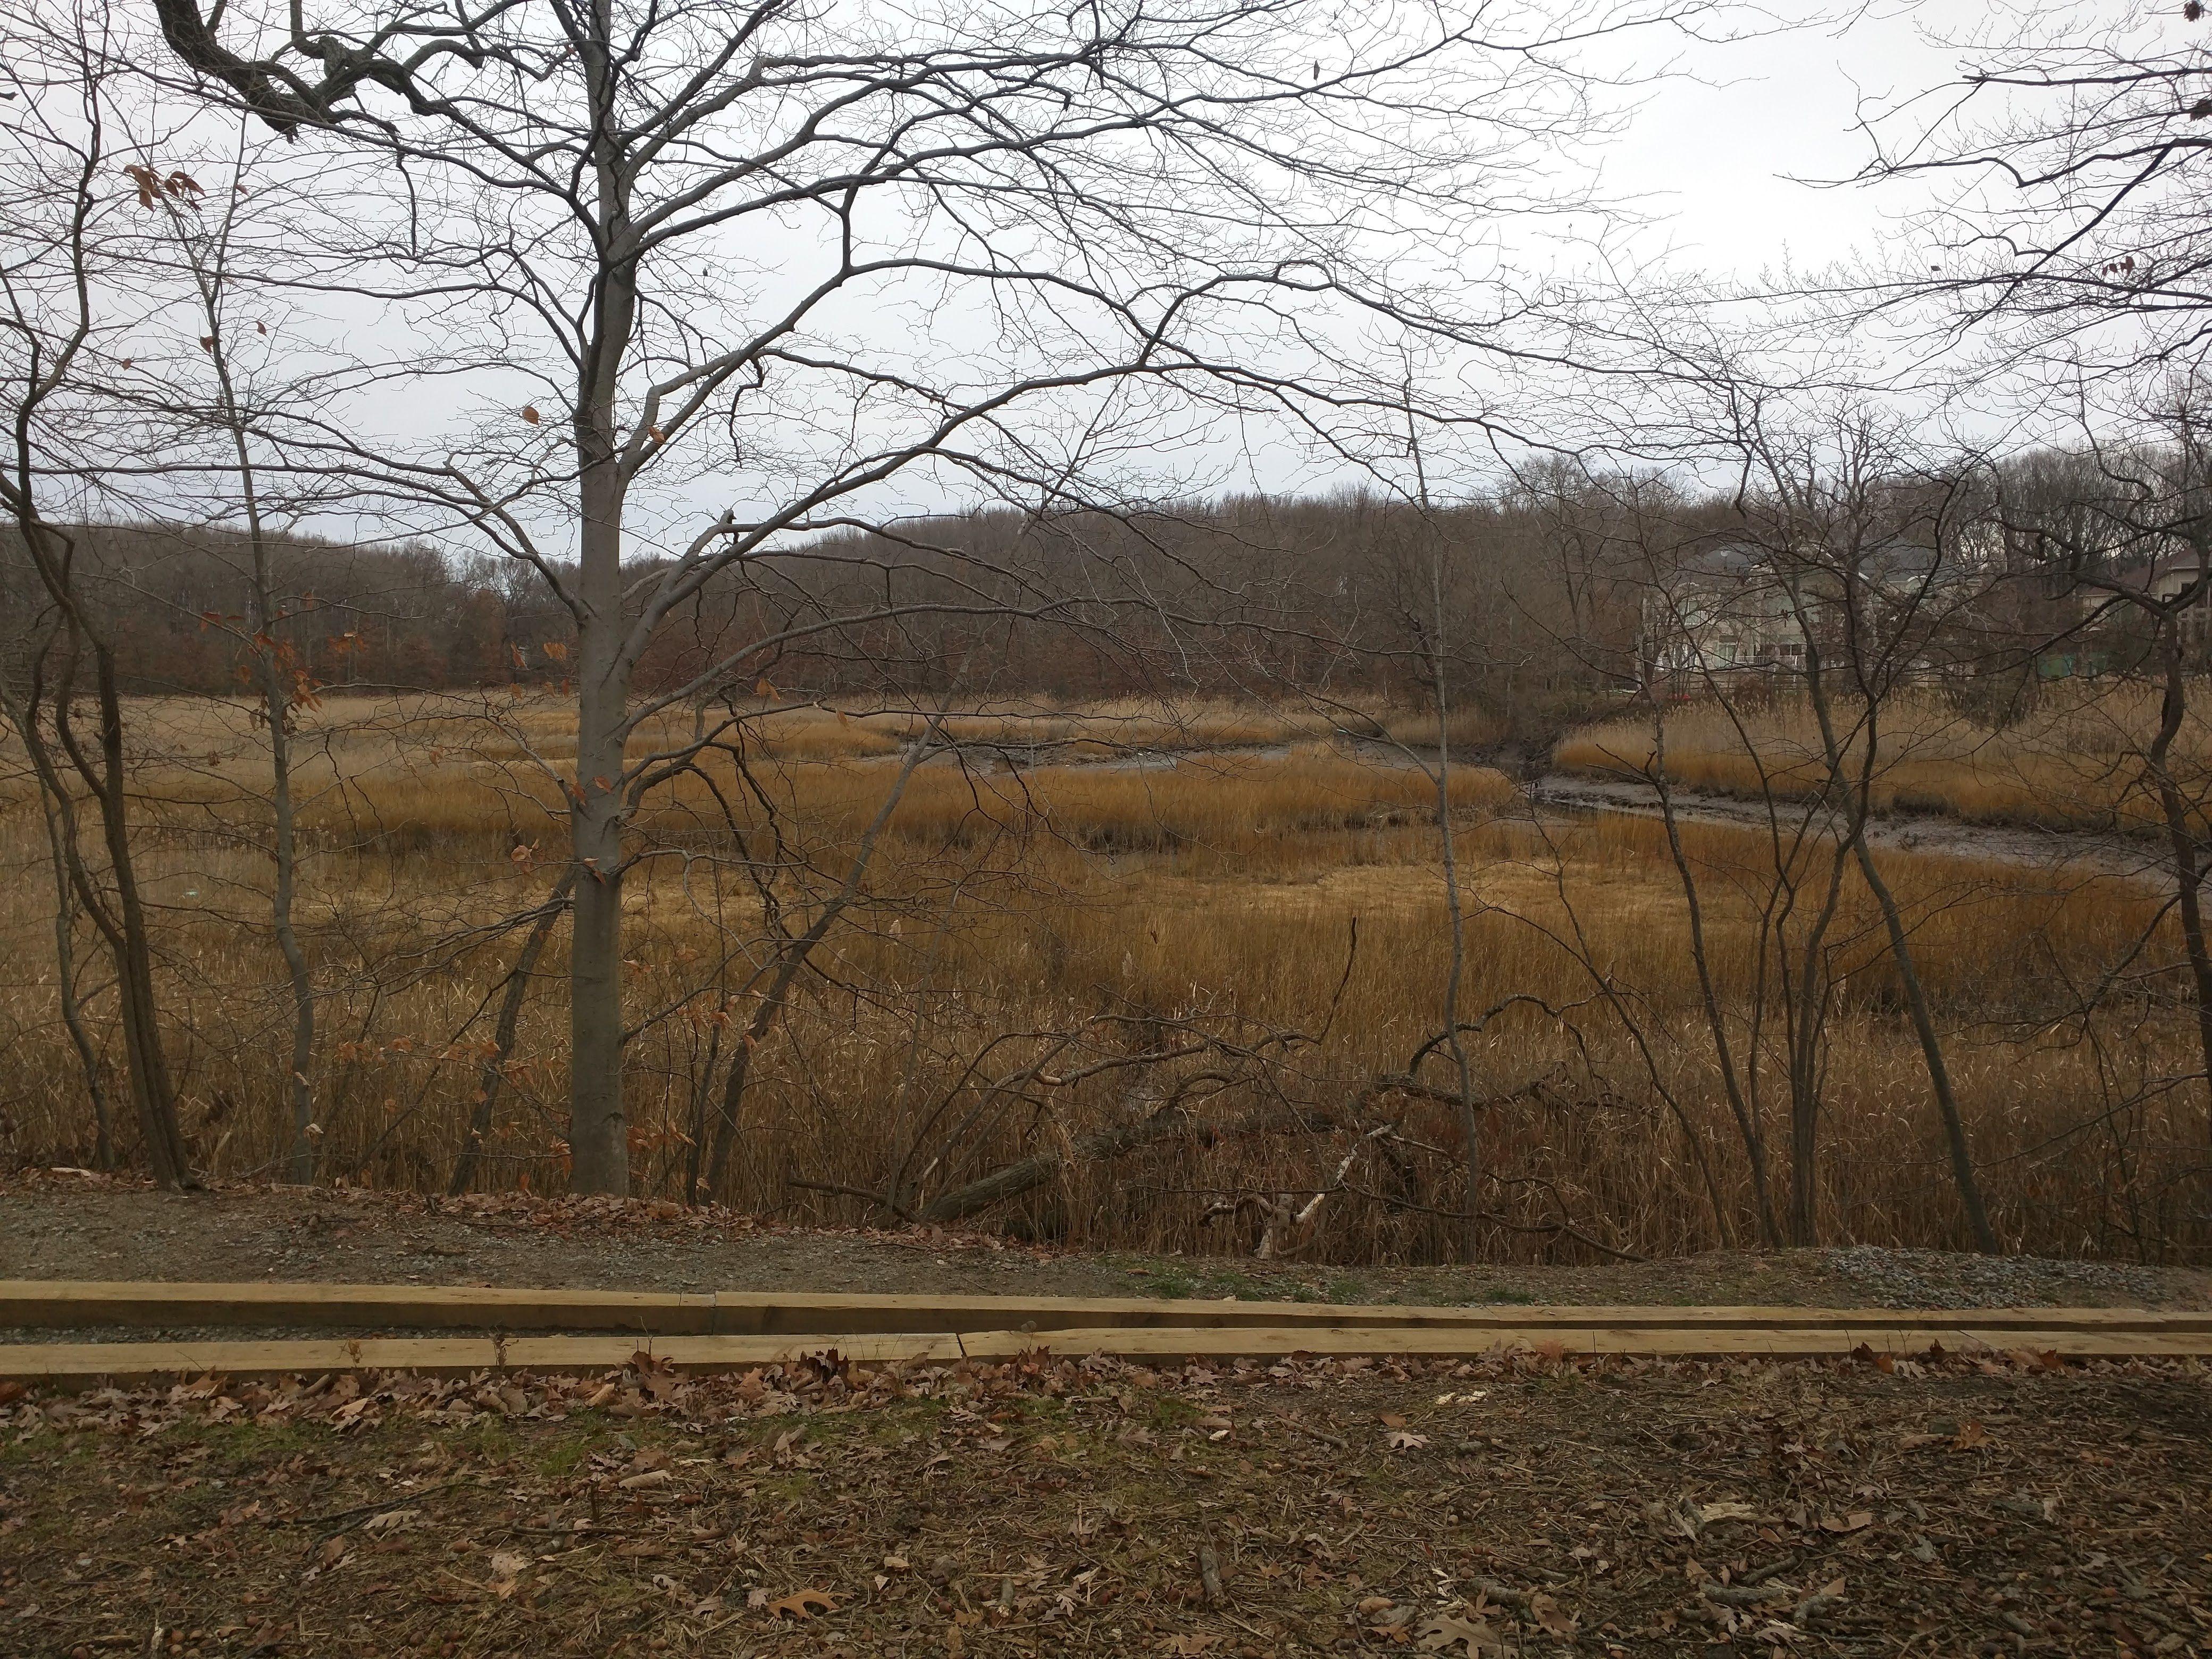 Lemon Creek Lemon Creek, Located Within Richmond County, Staten Island,  Encompasses 41.8 Acres Of Wonderfully Diverse Tidal Wetlands That Invite  All ...